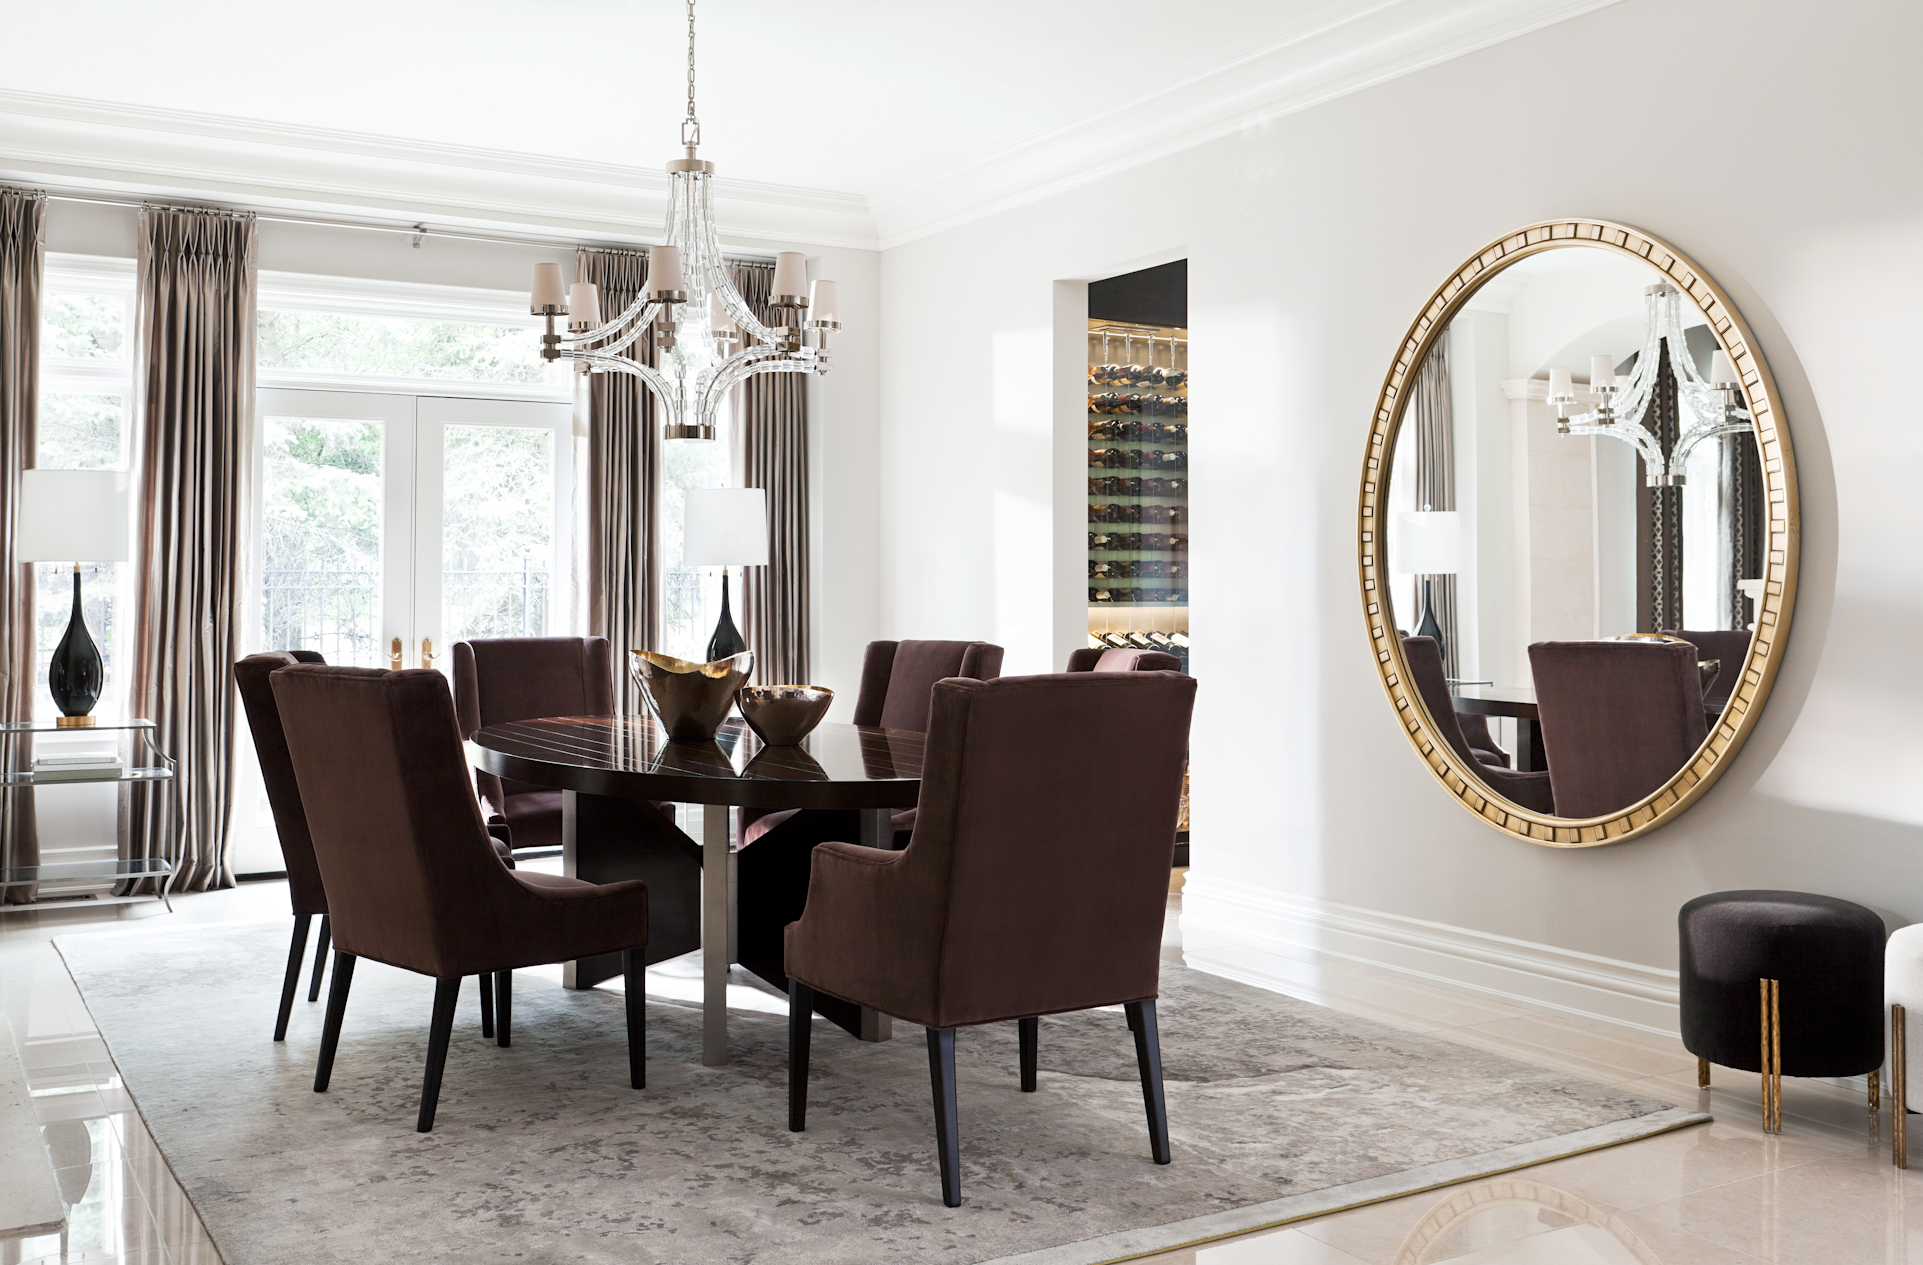 Dining Room designed by Elizabeth Metcalfe Interiors & Design Inc. by Elizabeth Metcalfe Interiors & Design Inc.